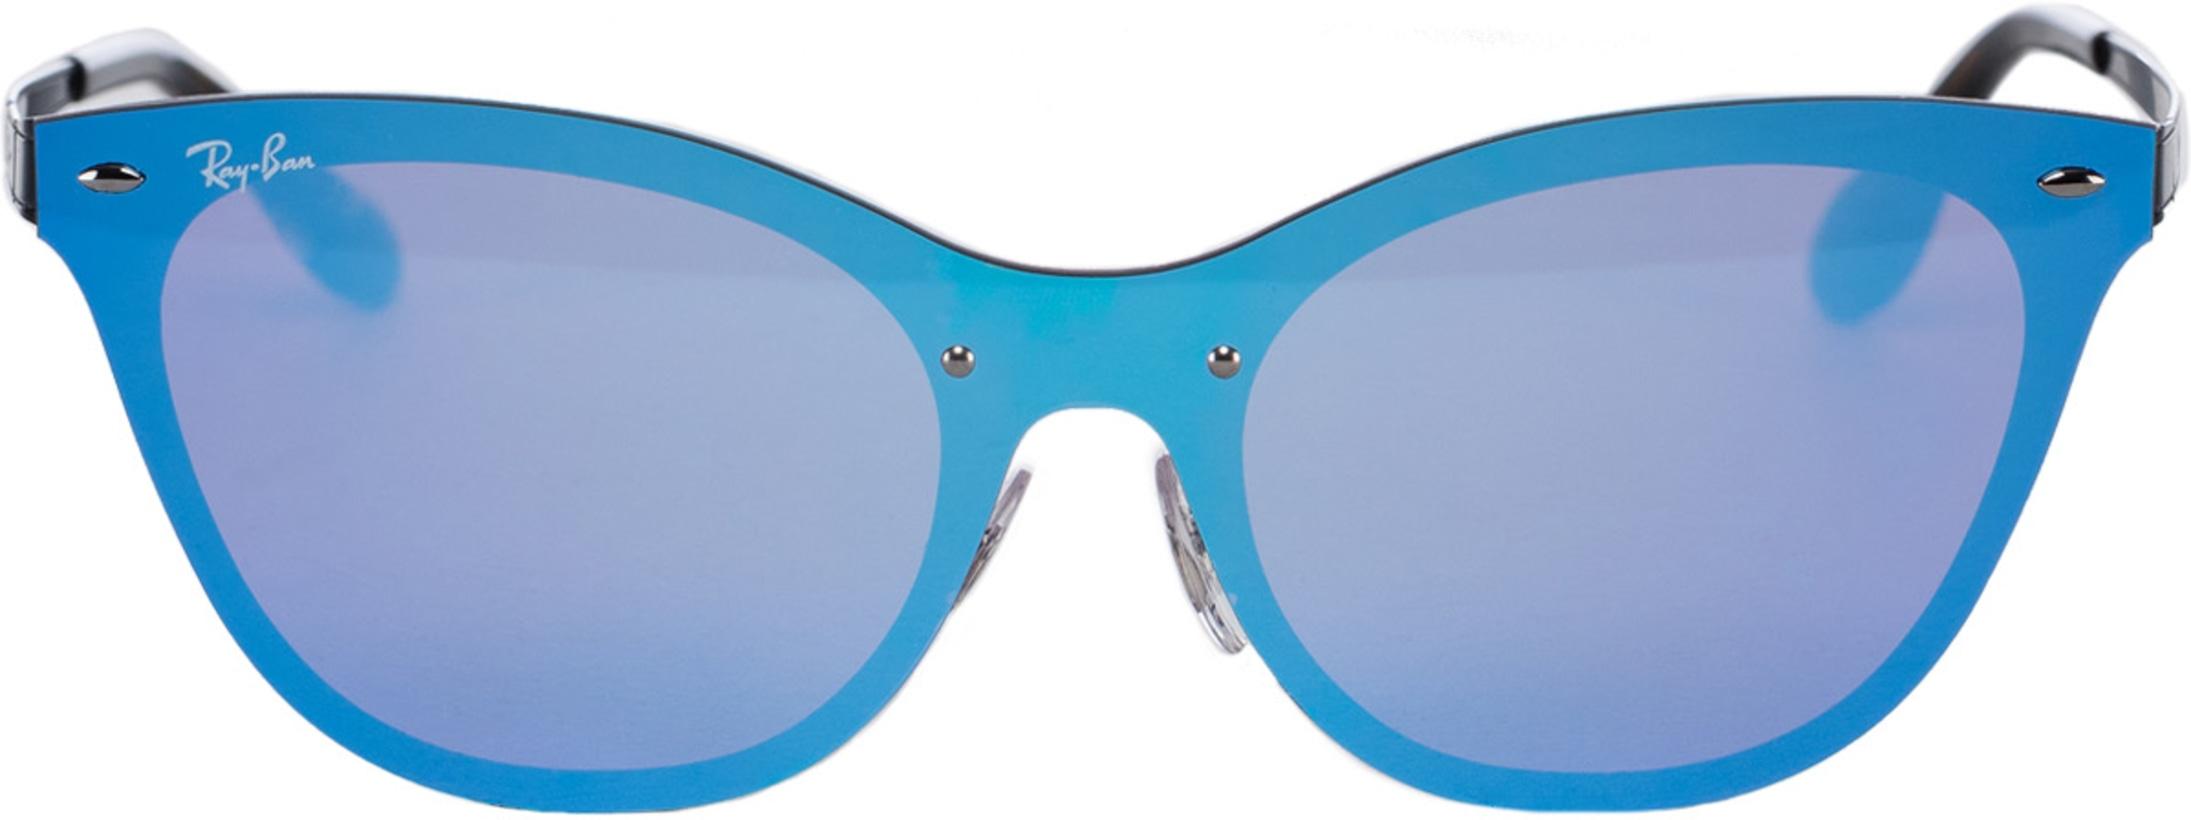 1f180d2b97 Ray-Ban  Blaze Cat Eye Sunglasses - Black Violet Blue Mirror ...